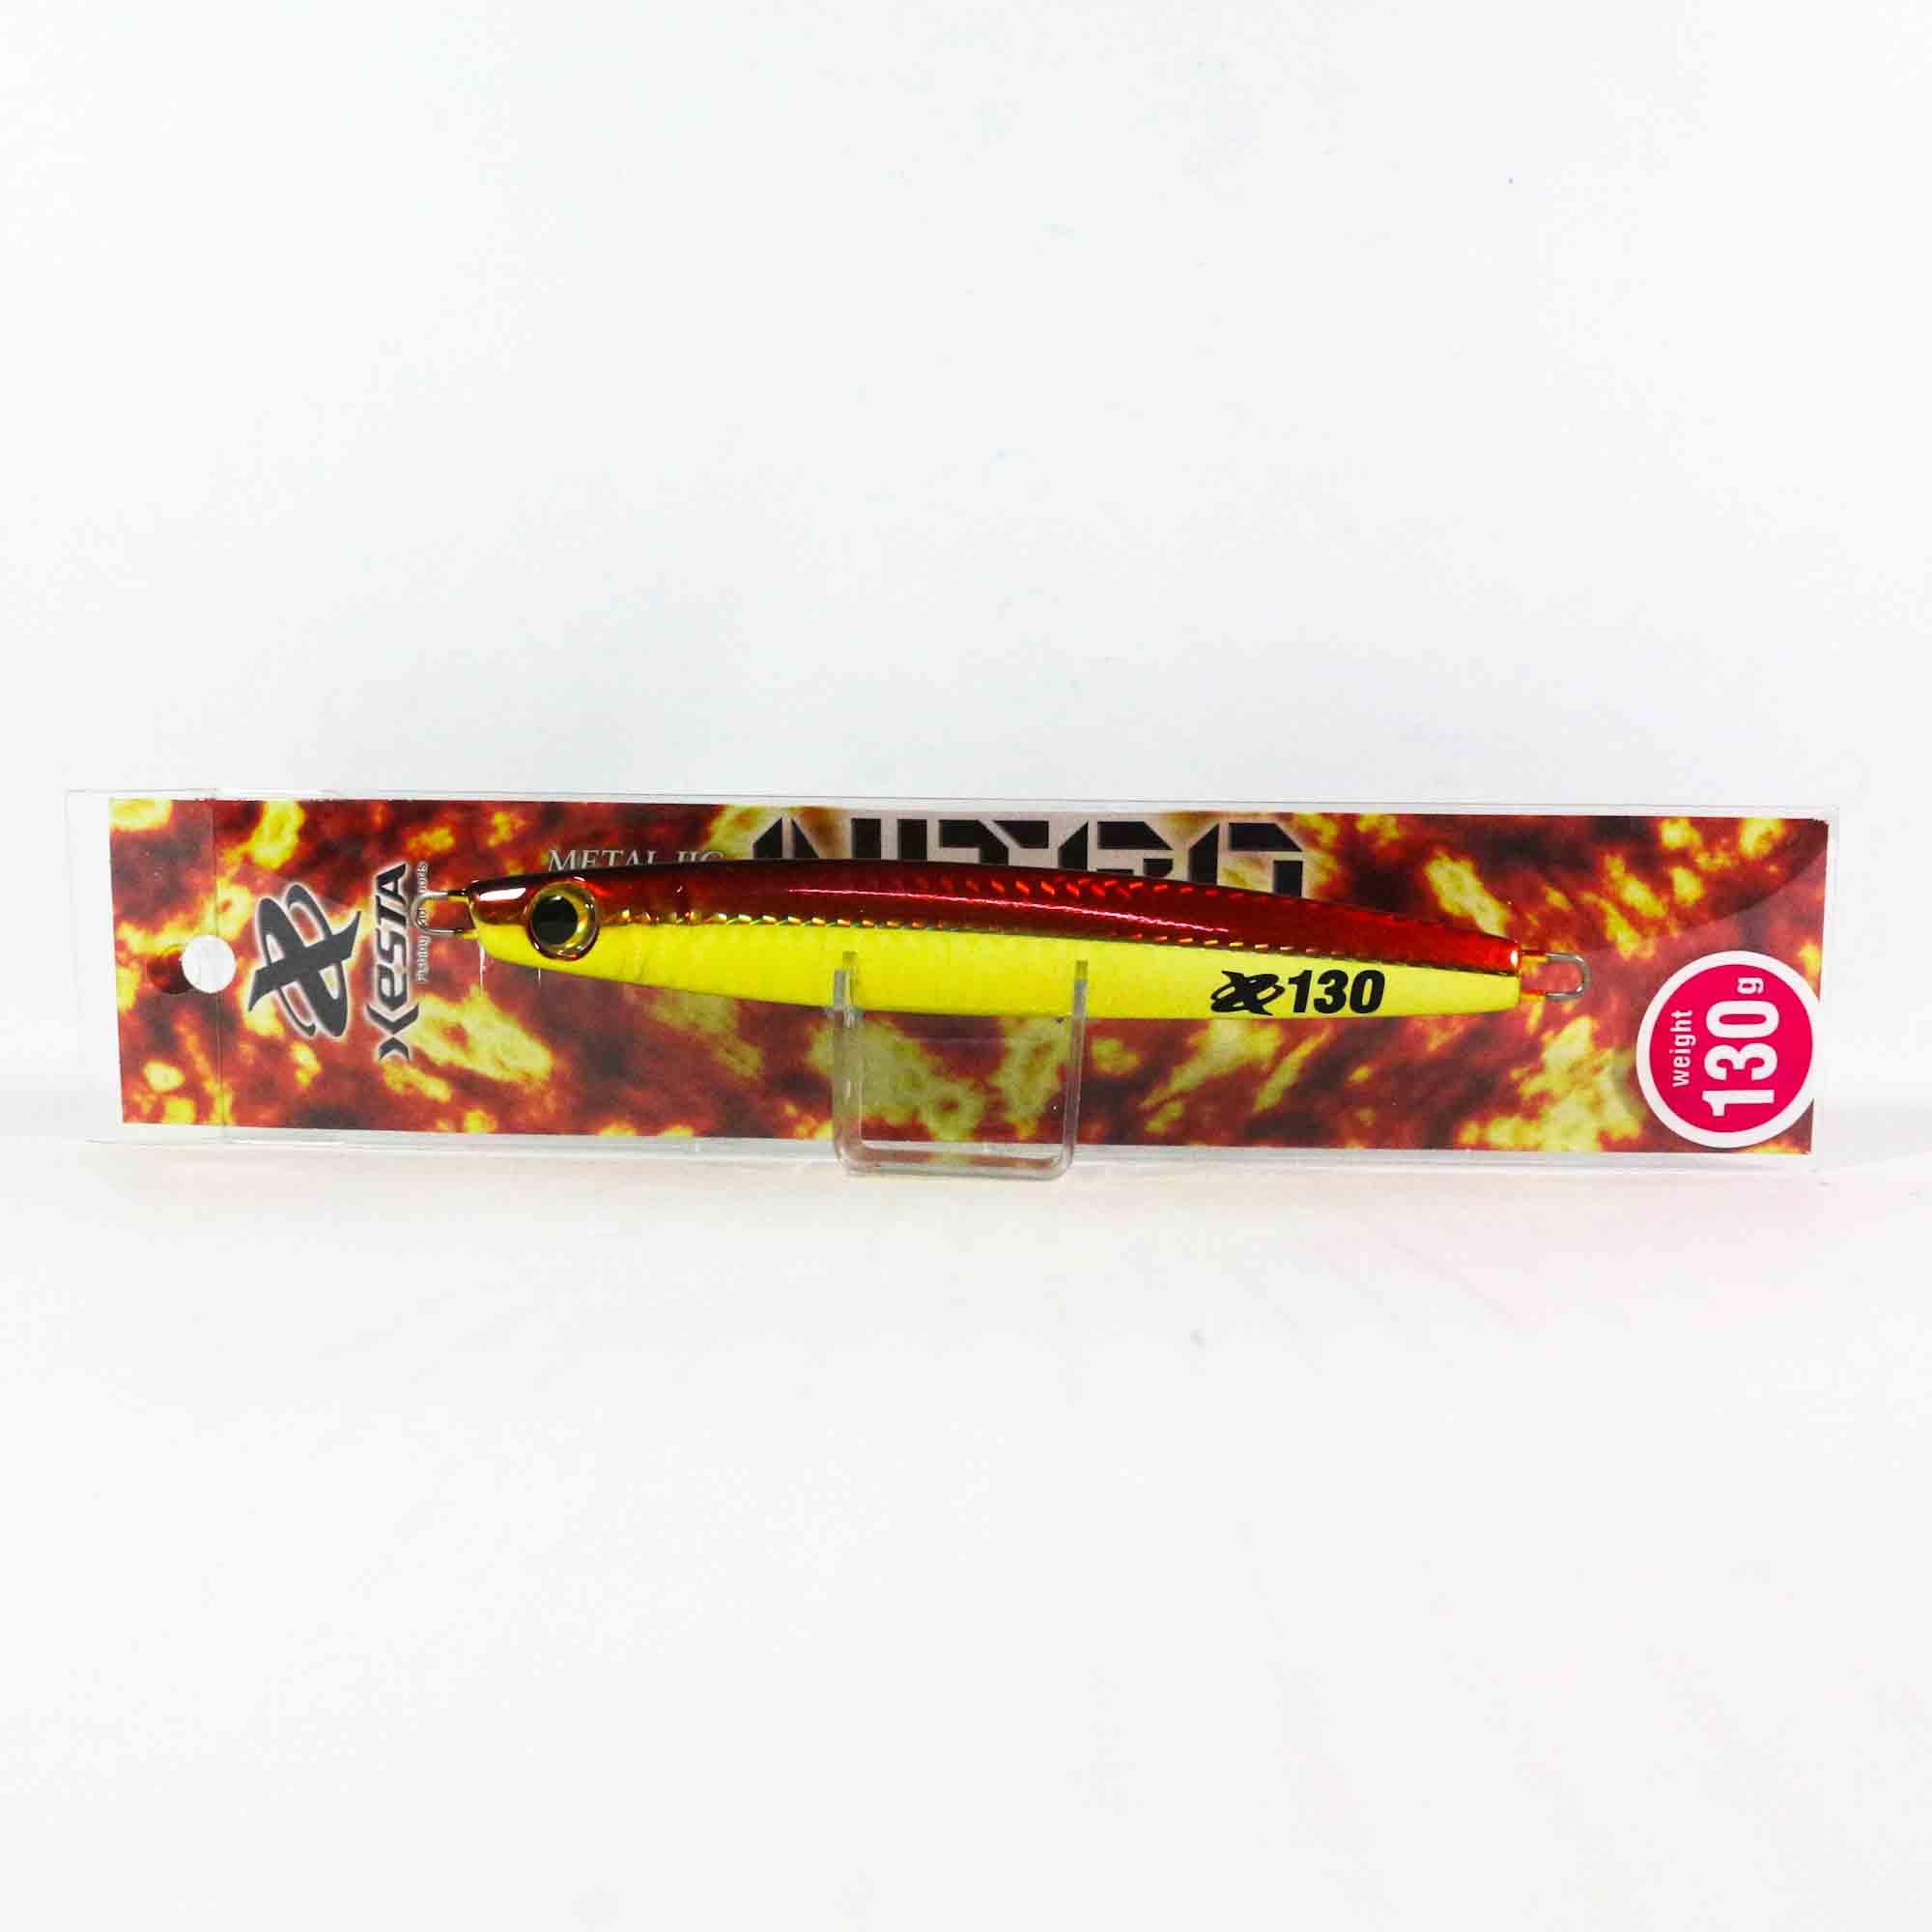 Sale Xesta Metal Jig Nitro Casting 130 grams RGD (6831)